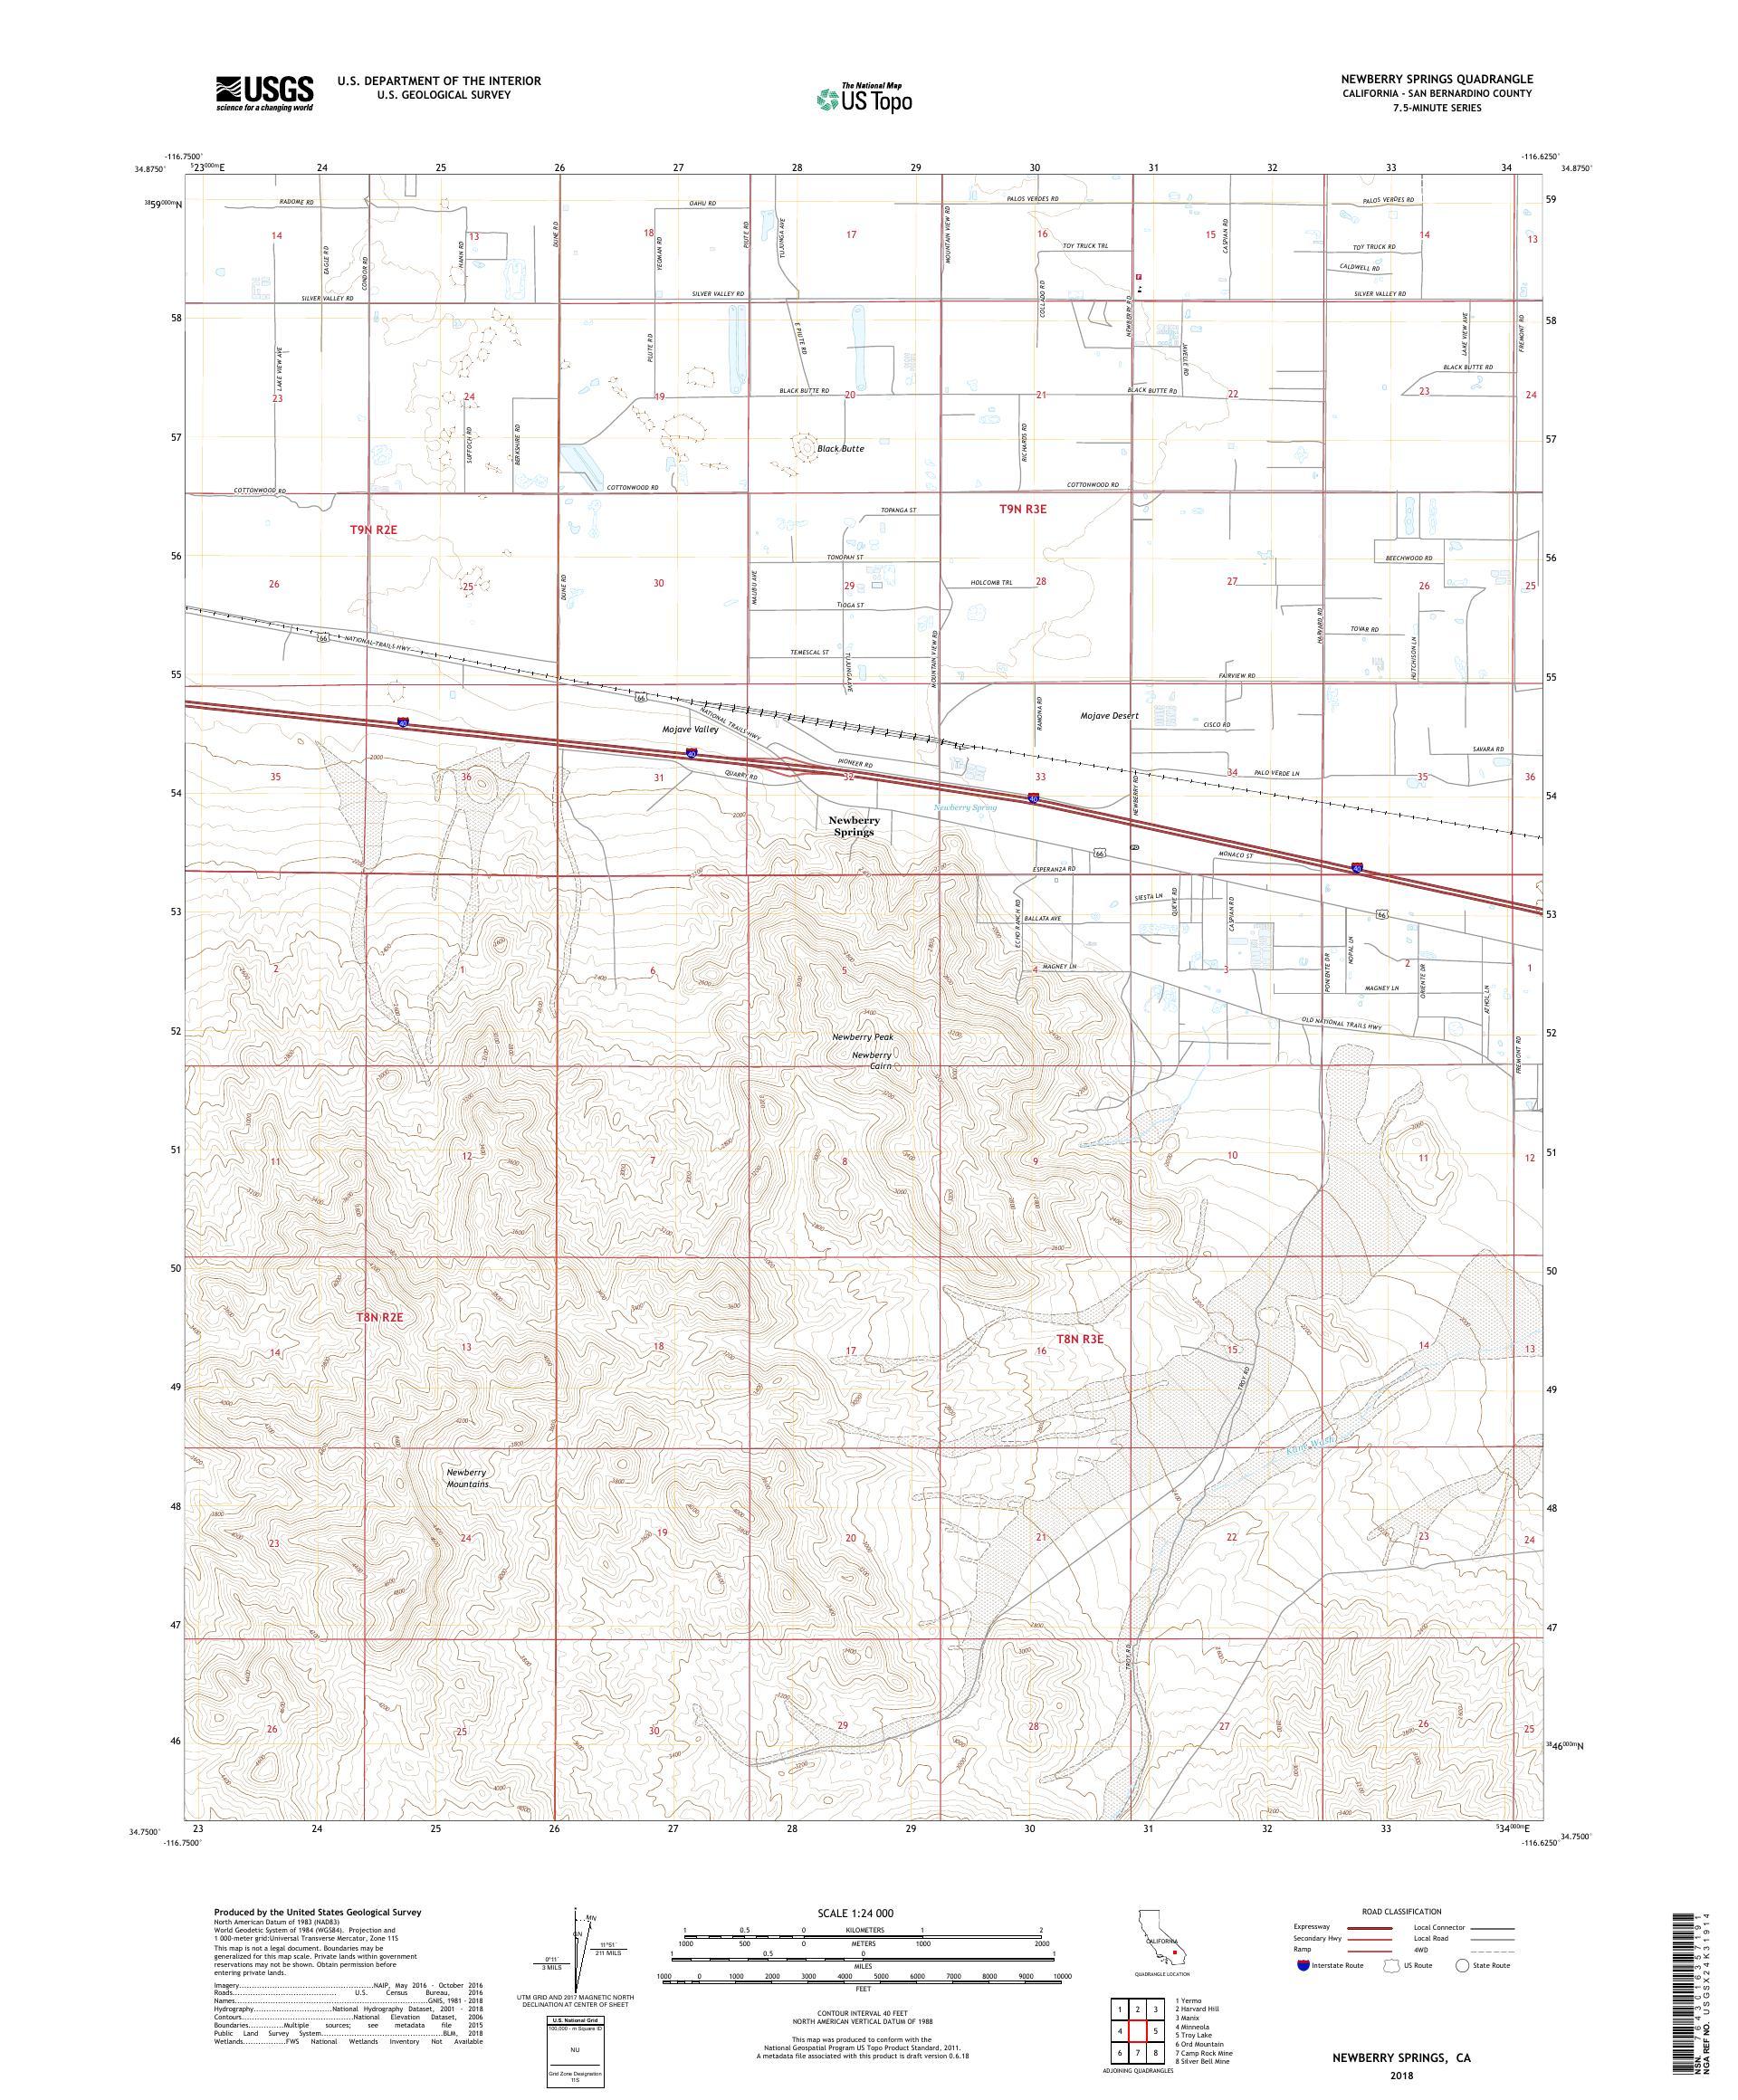 MyTopo Newberry Springs, California USGS Quad Topo Map